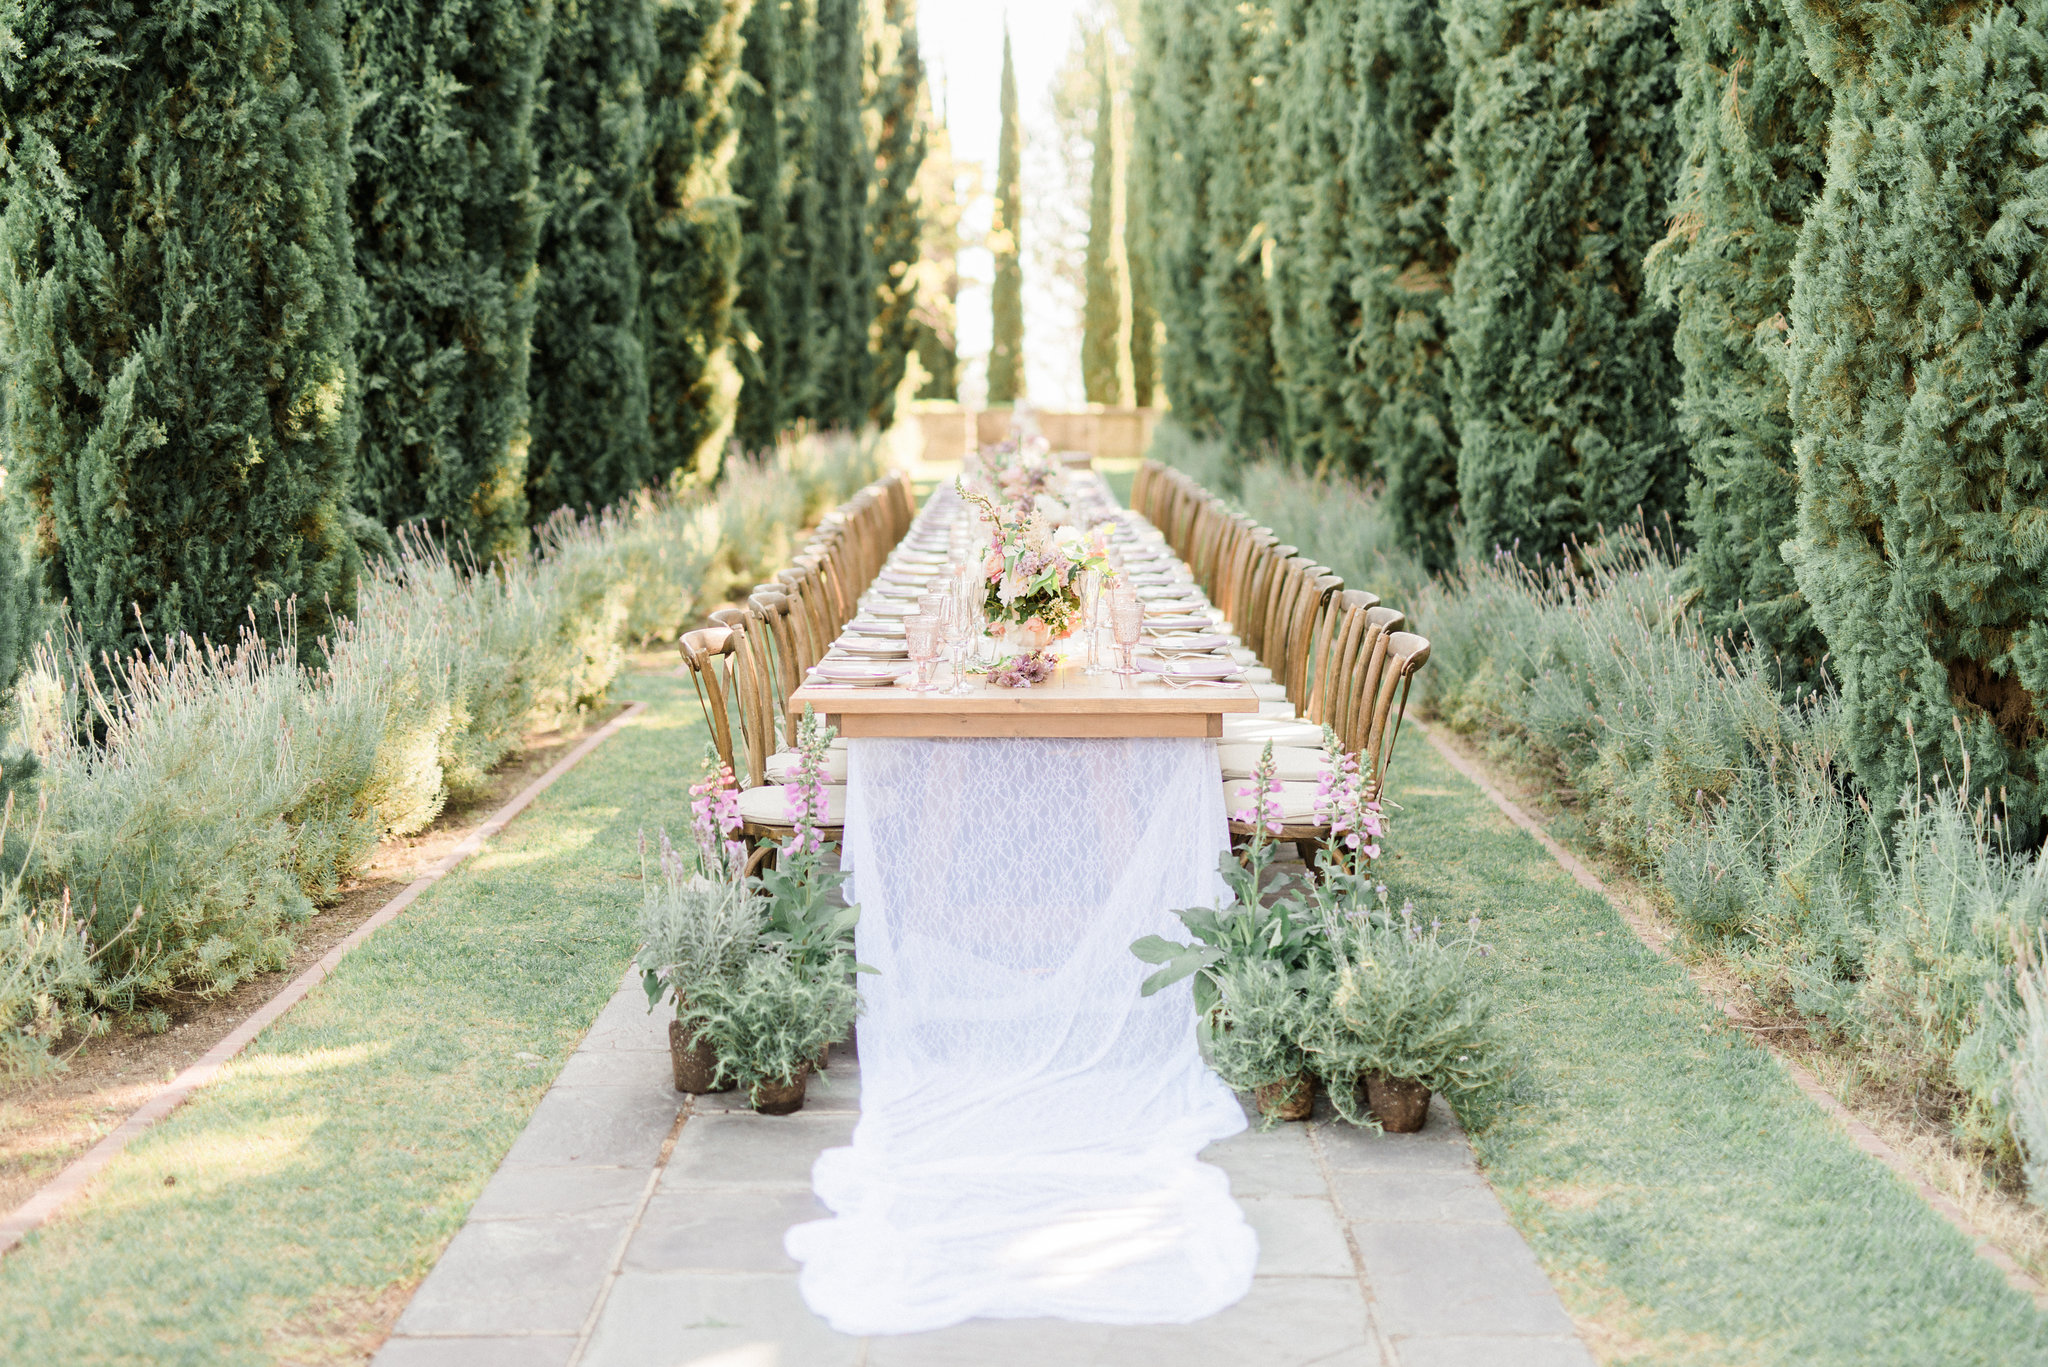 linajaandmichael-wedding-791.jpg